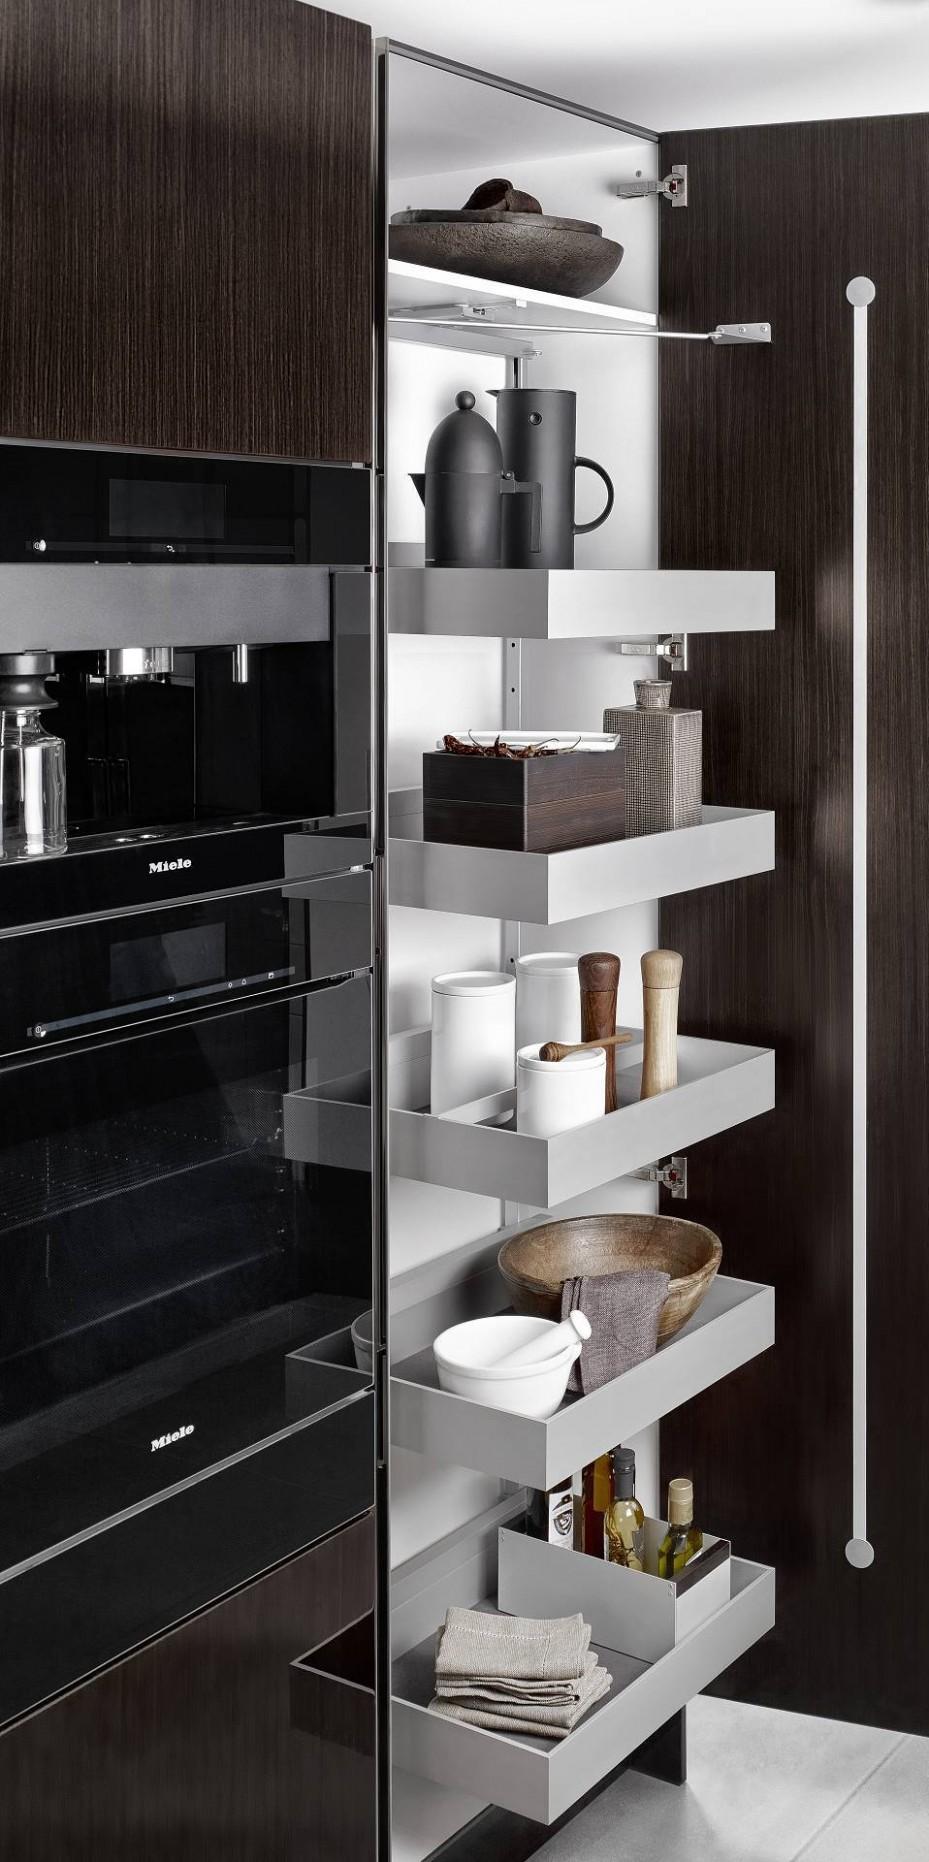 Luxury Kitchen Cabinets Designs in Dubai  SieMatic UAE - Kitchen Cabinet Accessories Dubai